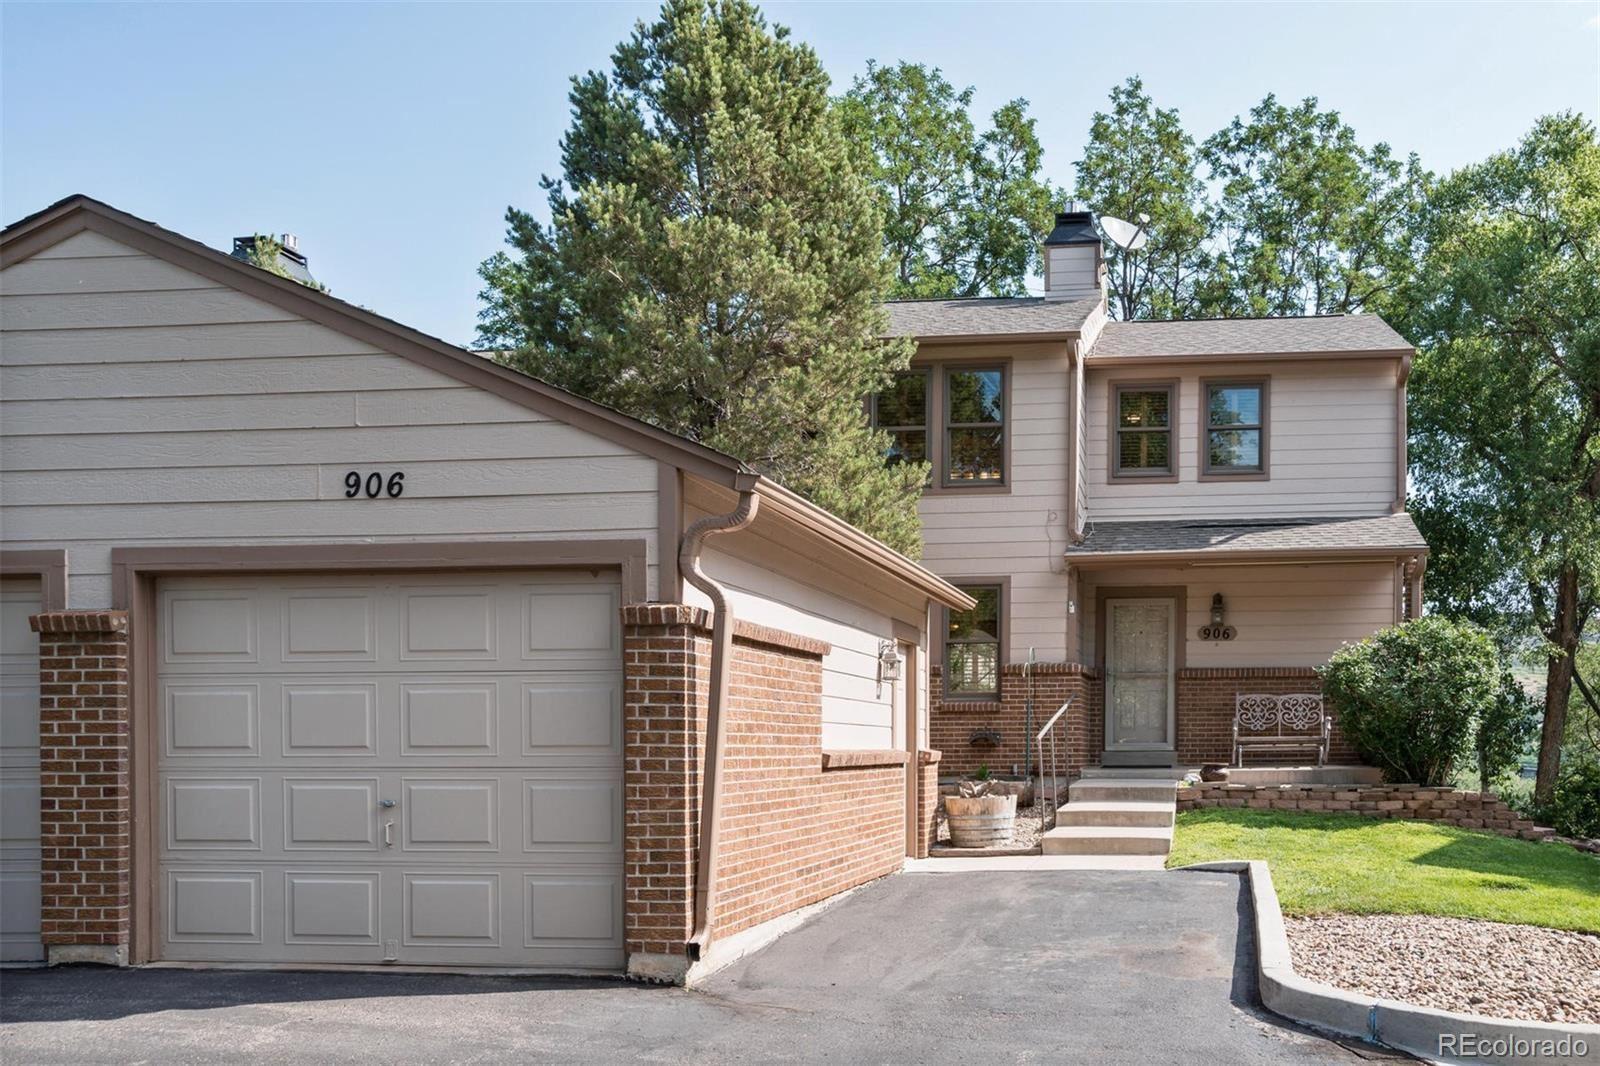 906 Homestake Drive, Golden, CO 80401 - #: 8330780